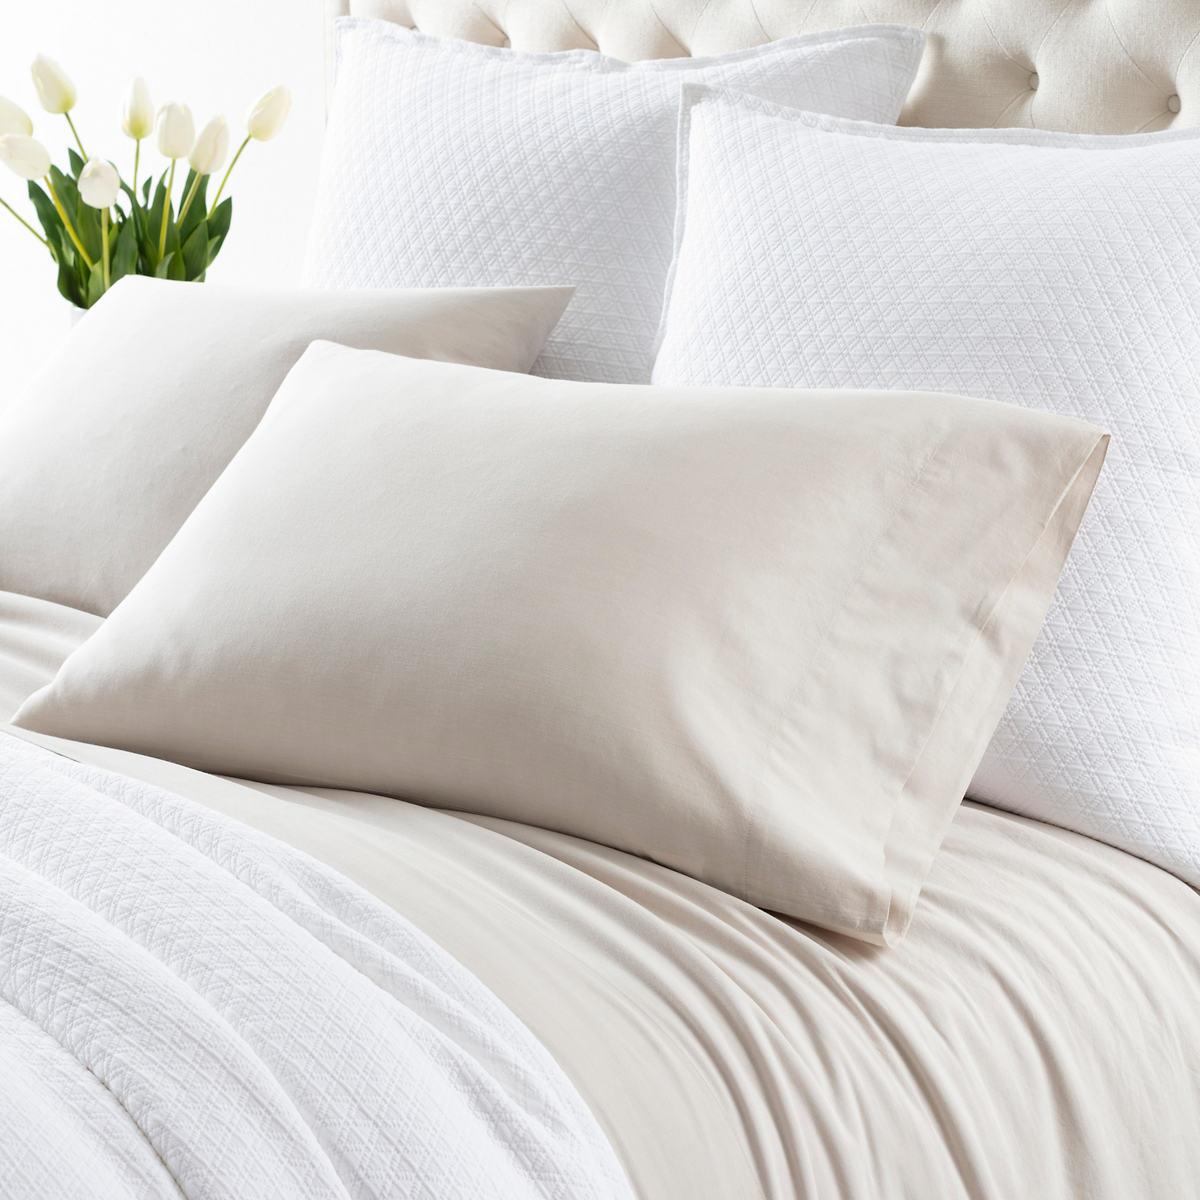 Comfy Cotton Natural Pillowcases